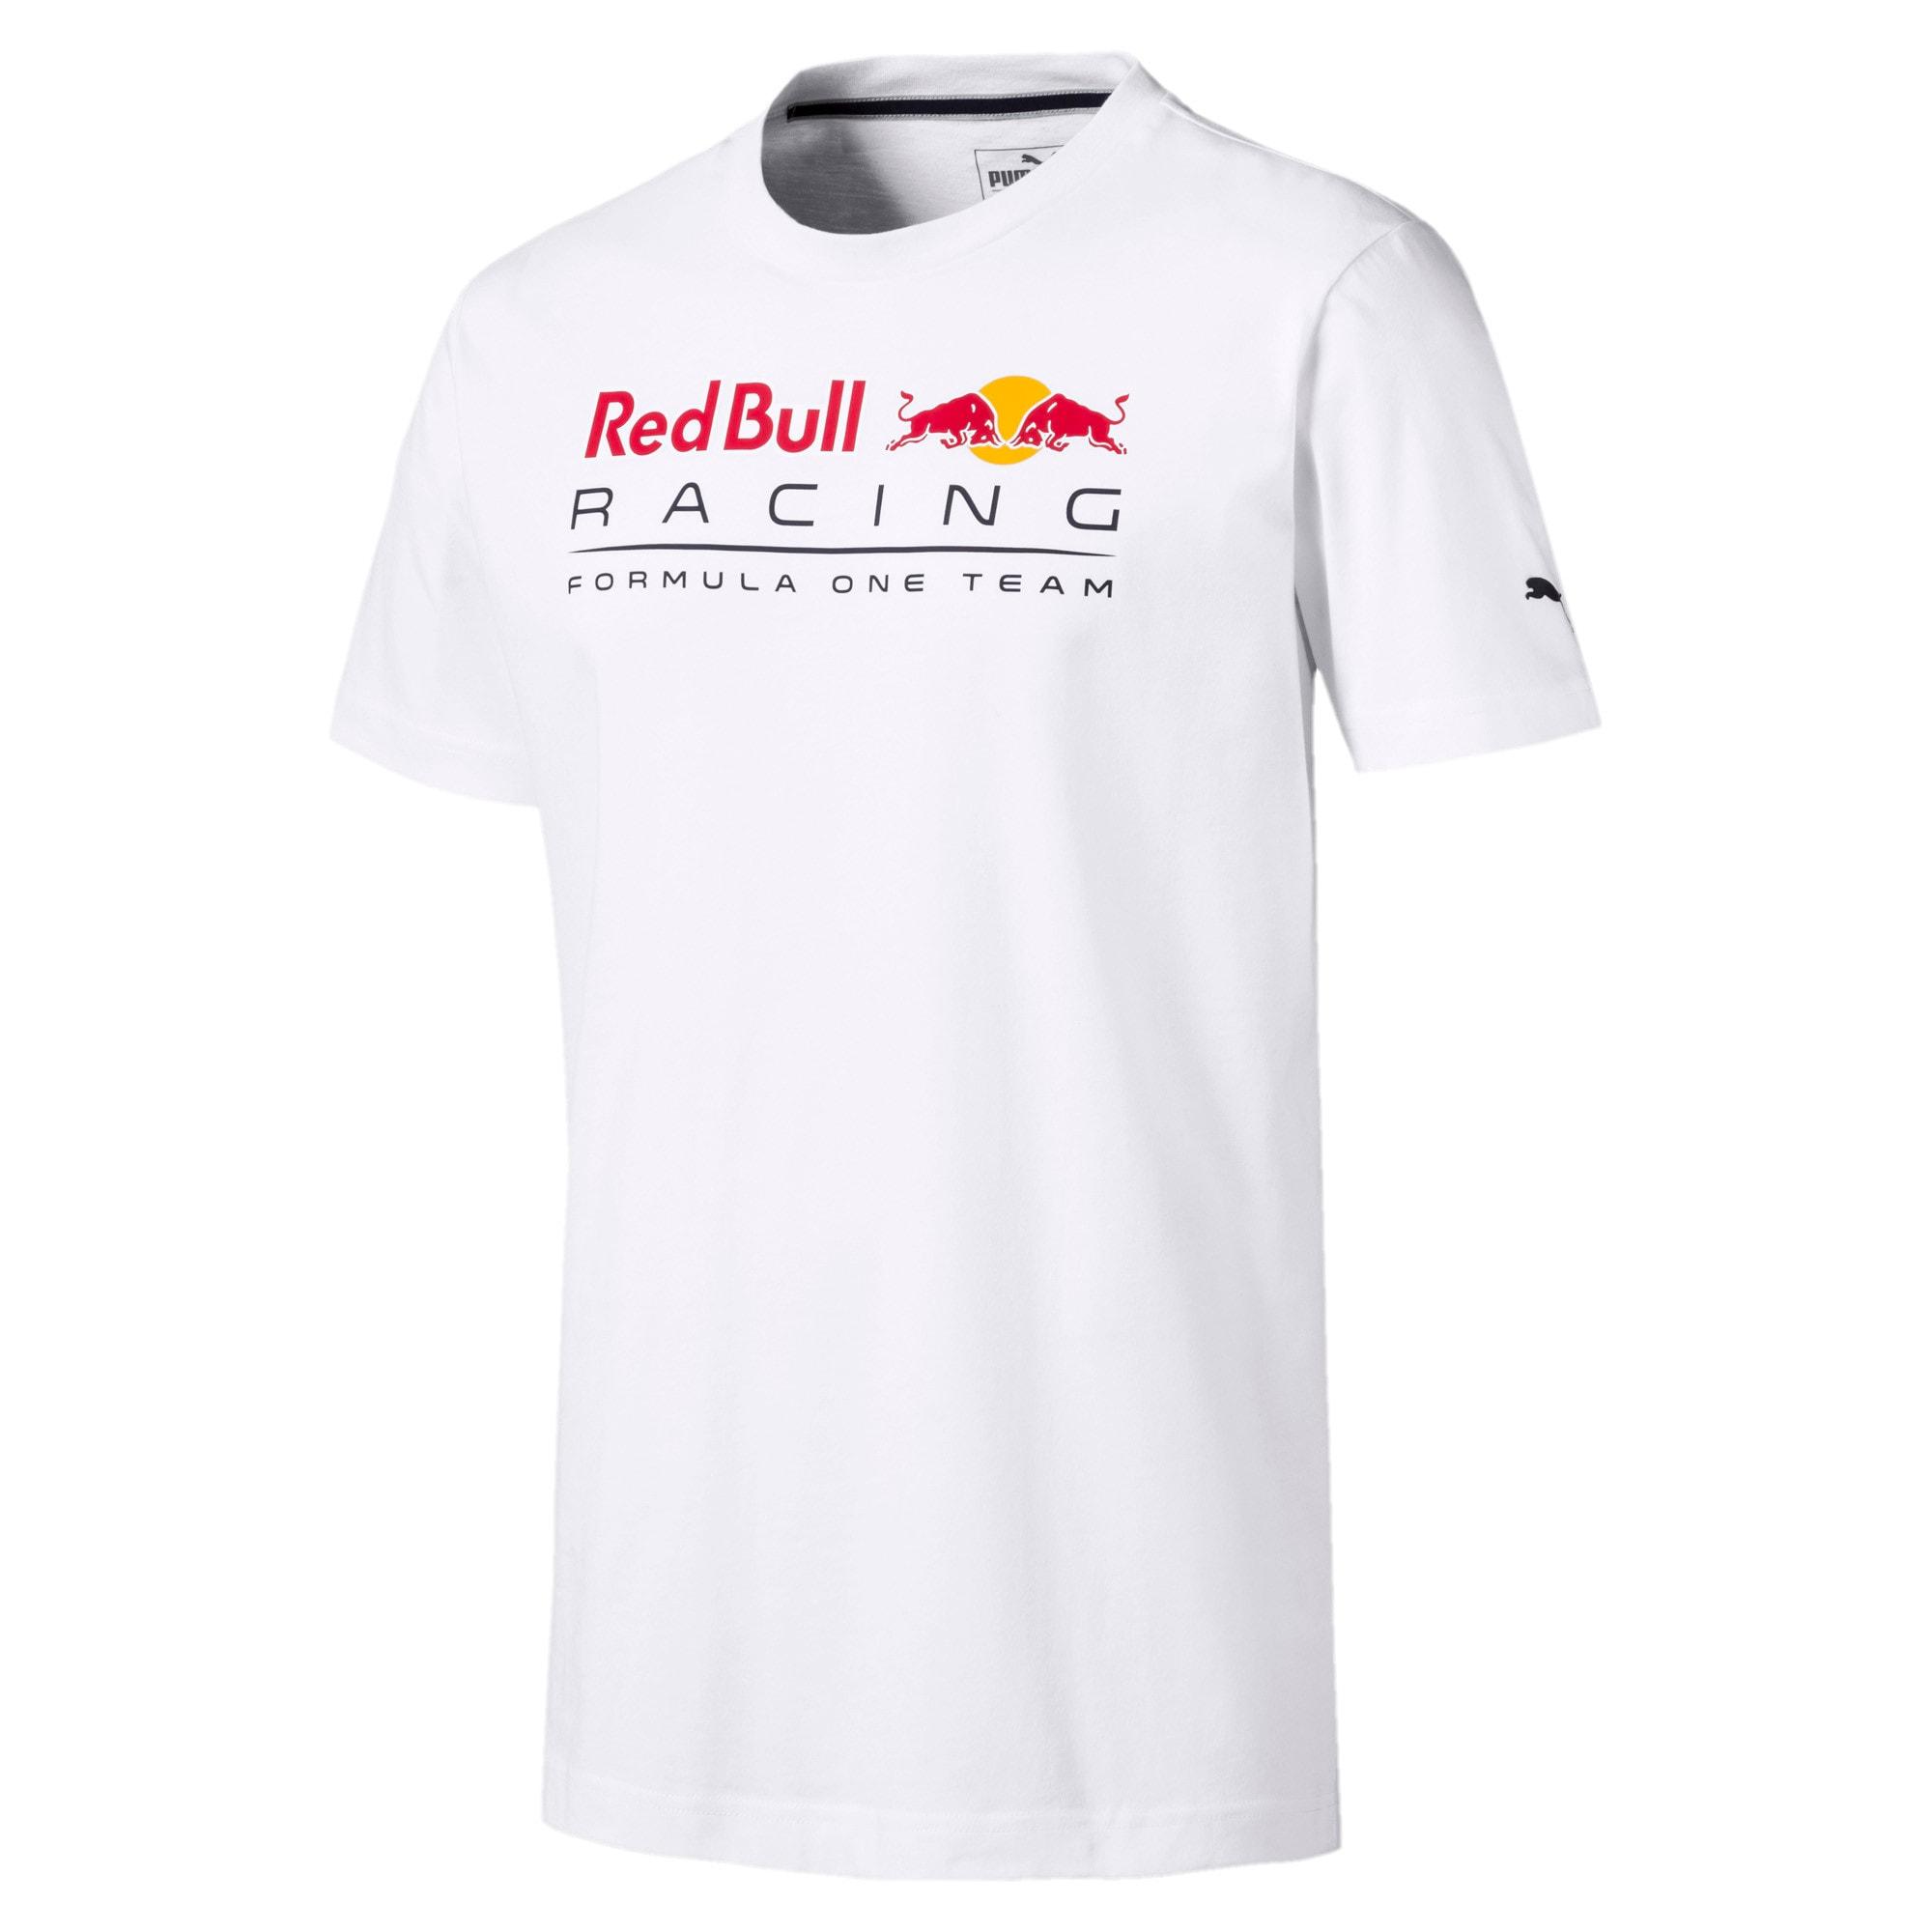 Thumbnail 4 of Red Bull Racing logo-T-shirt voor heren, Puma White, medium